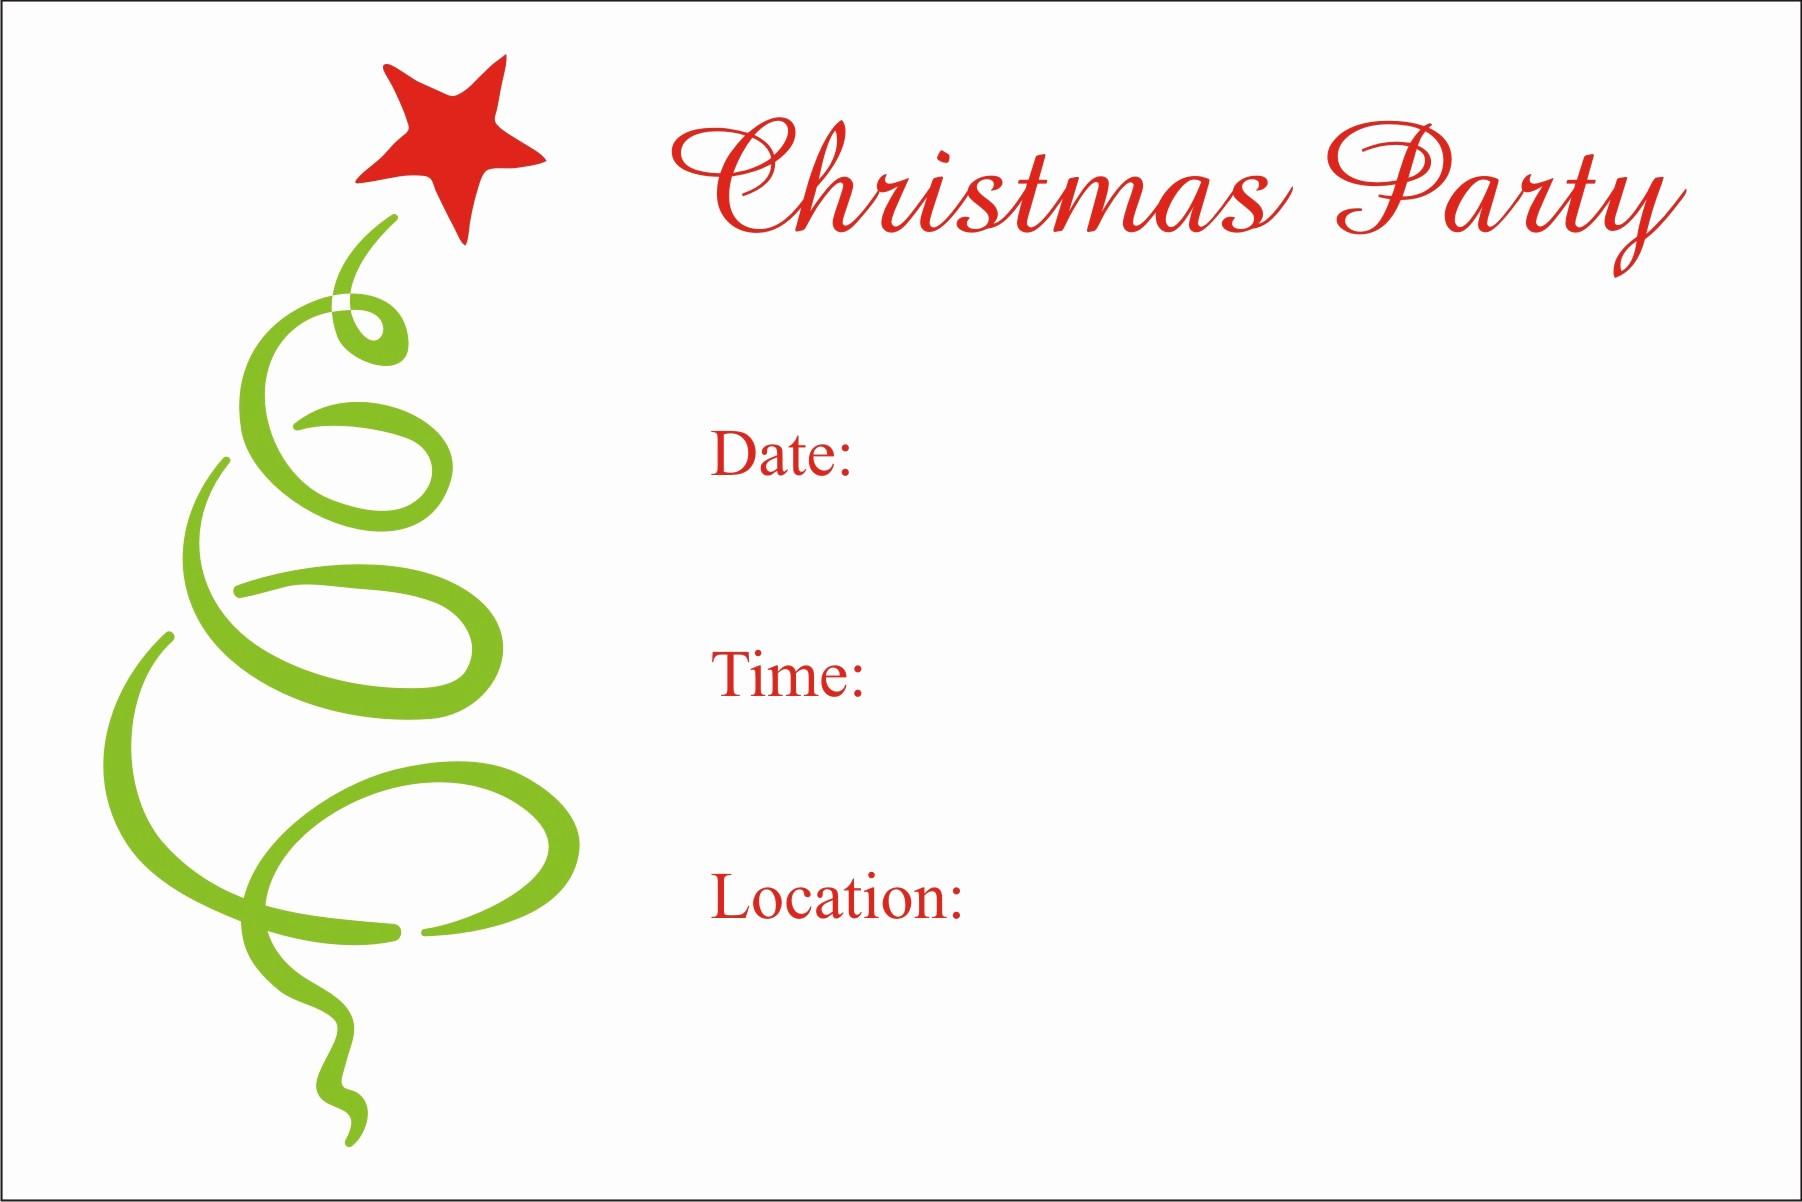 Free Online Christmas Party Invitations Unique Personalized Party Invites News Personalized Party Invites